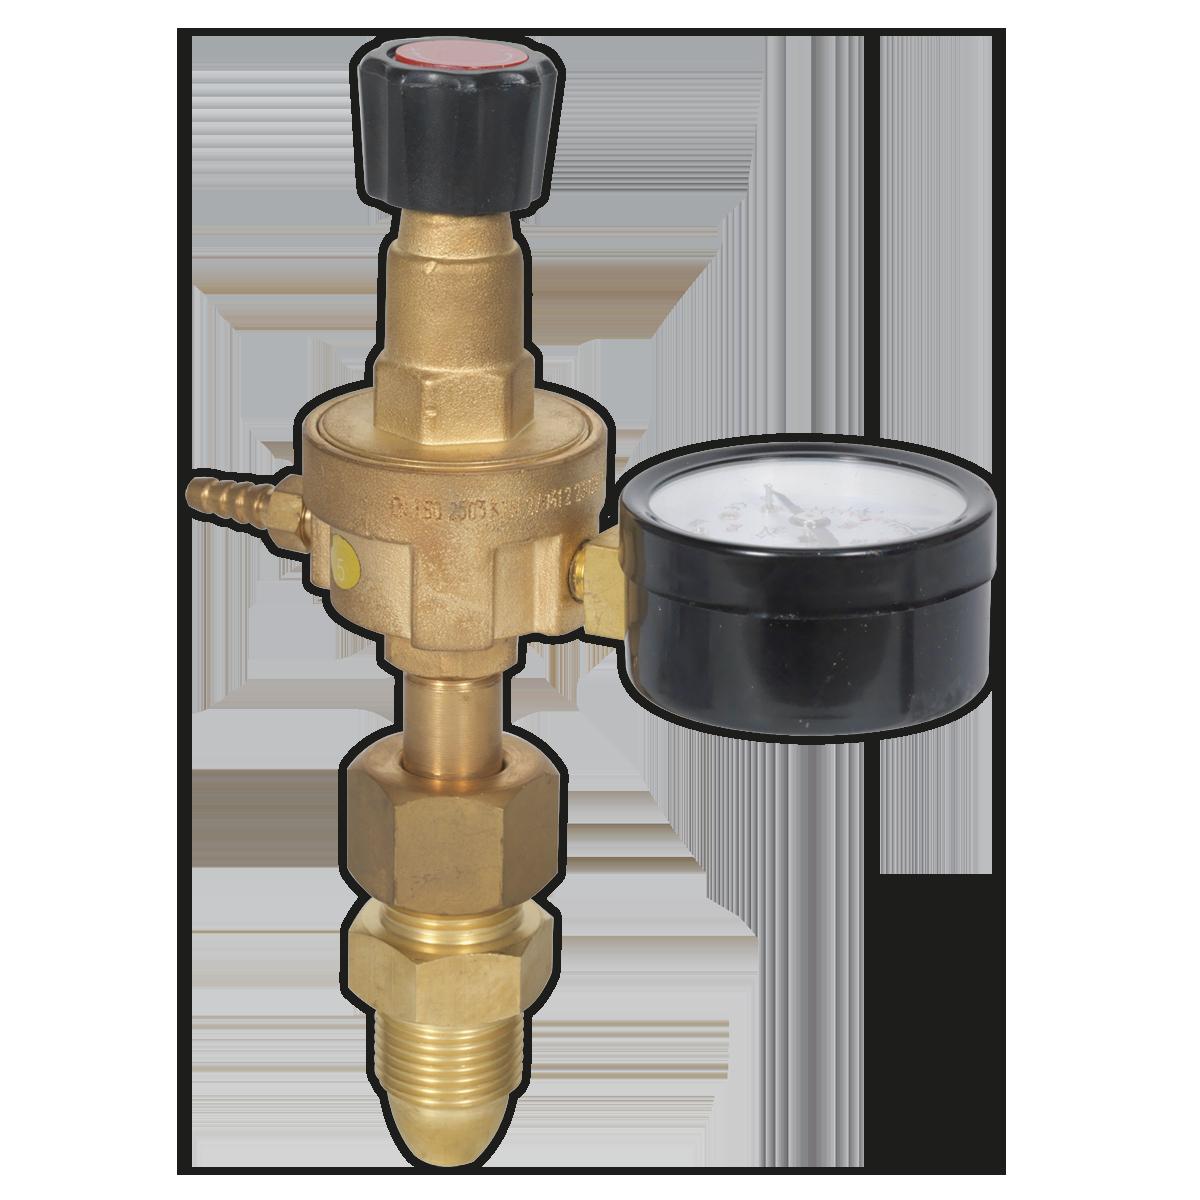 Sealey REG//MO MIG Gas Regulator 1 Gauge Industrial